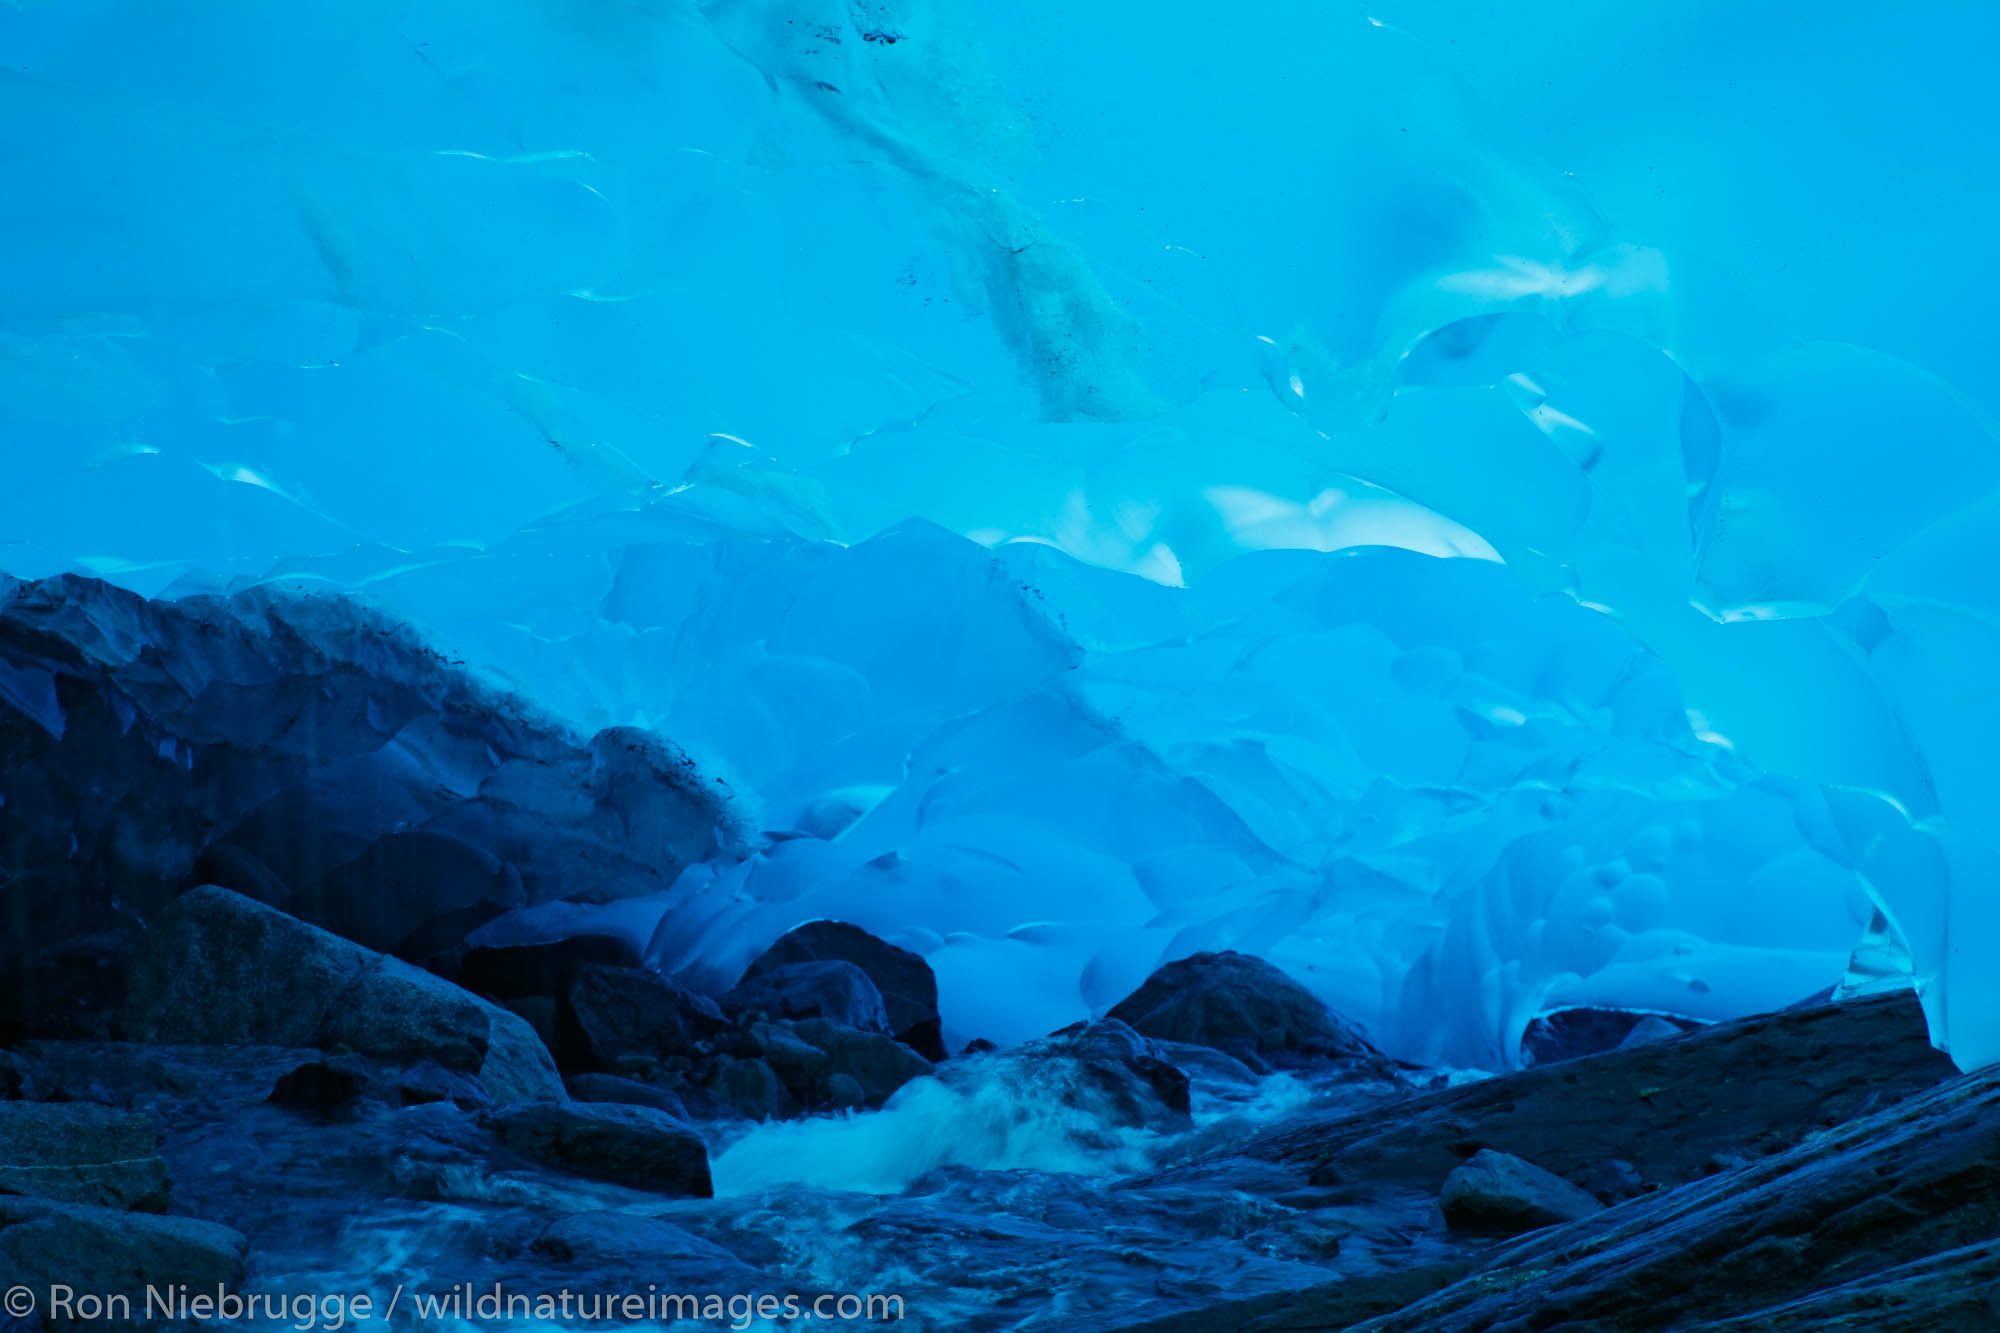 An ice cave in Mendenhall Glacier, Juneau, Alaska.